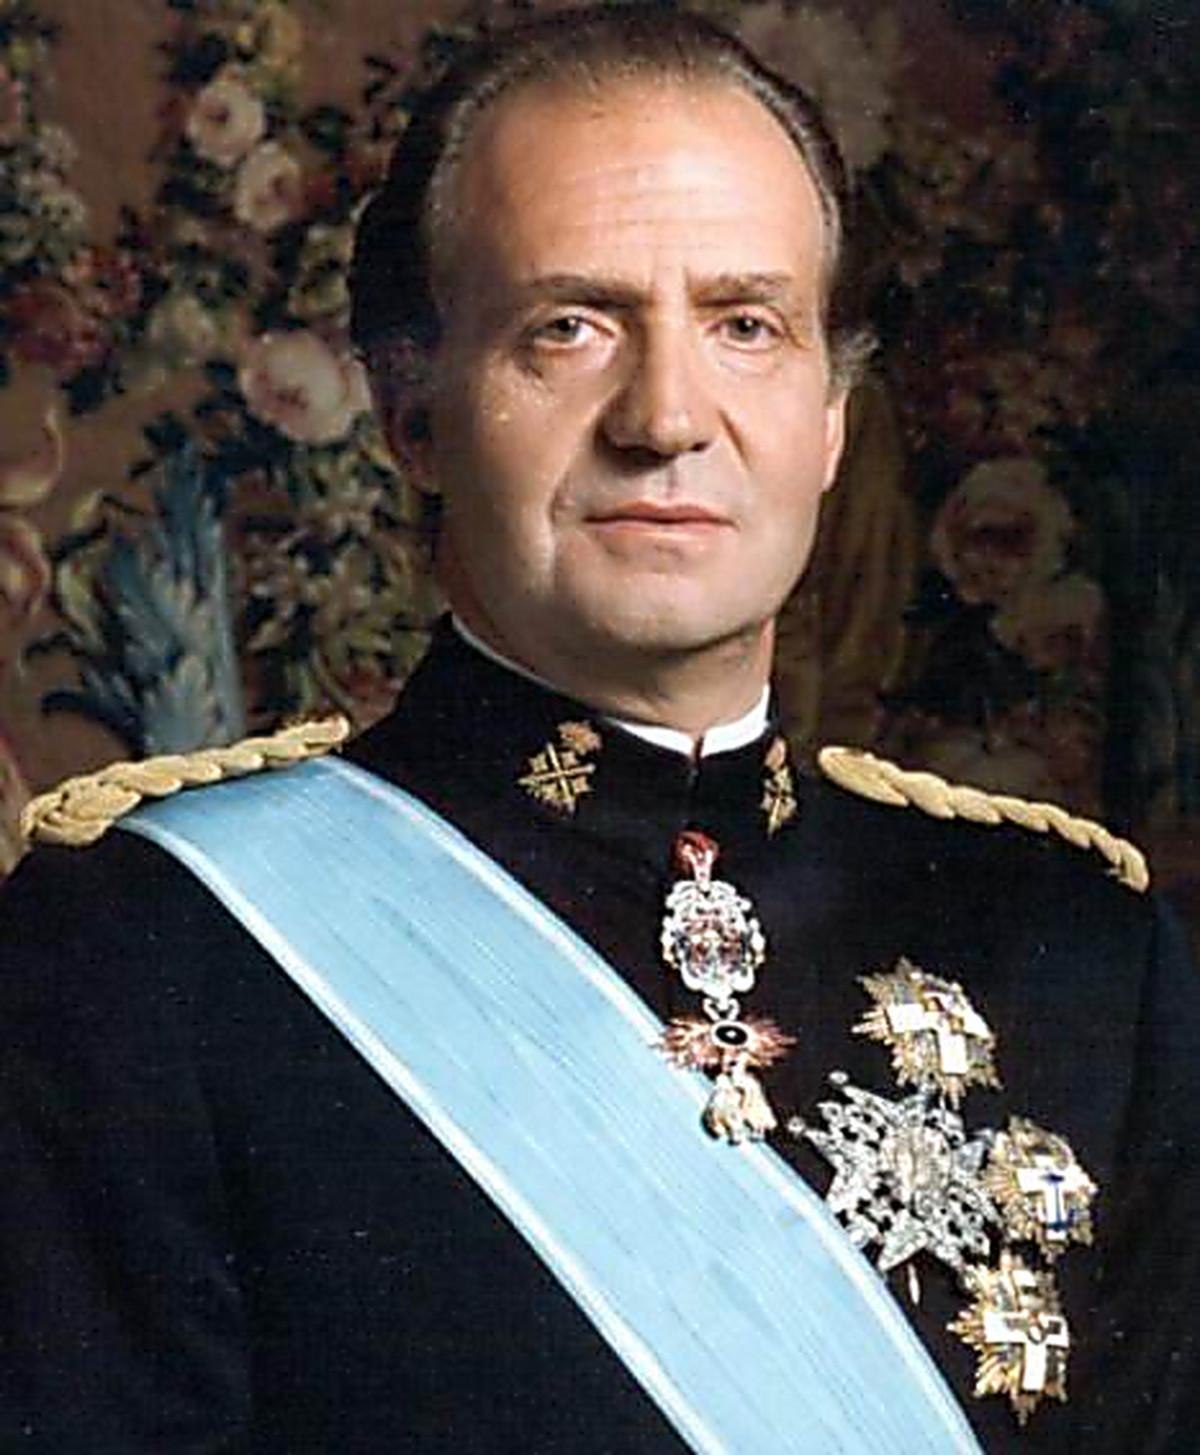 a biography of juan carlos de borbon y borbon the king of spain from 1975 to 2014 King juan carlos aka juan carlos de borbon y borbon born: king of spain, 1975-2014 father: juan de borbon felipe vi (king of spain, b 30-jan-1968).